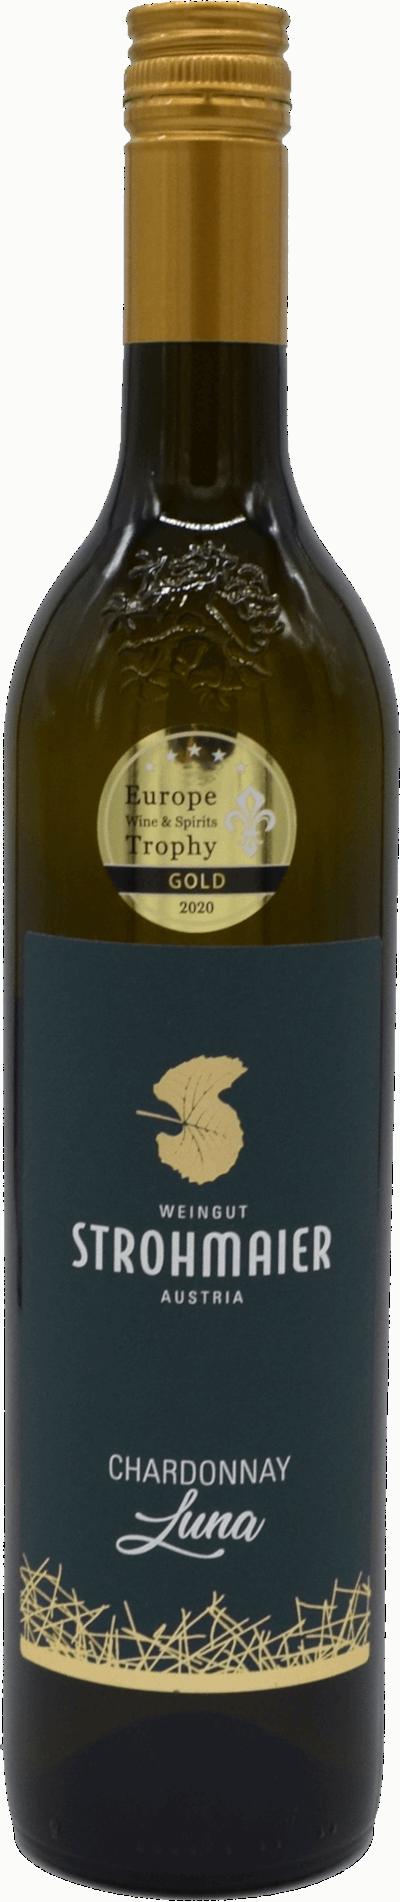 Strohmaier - Chardonnay Luna